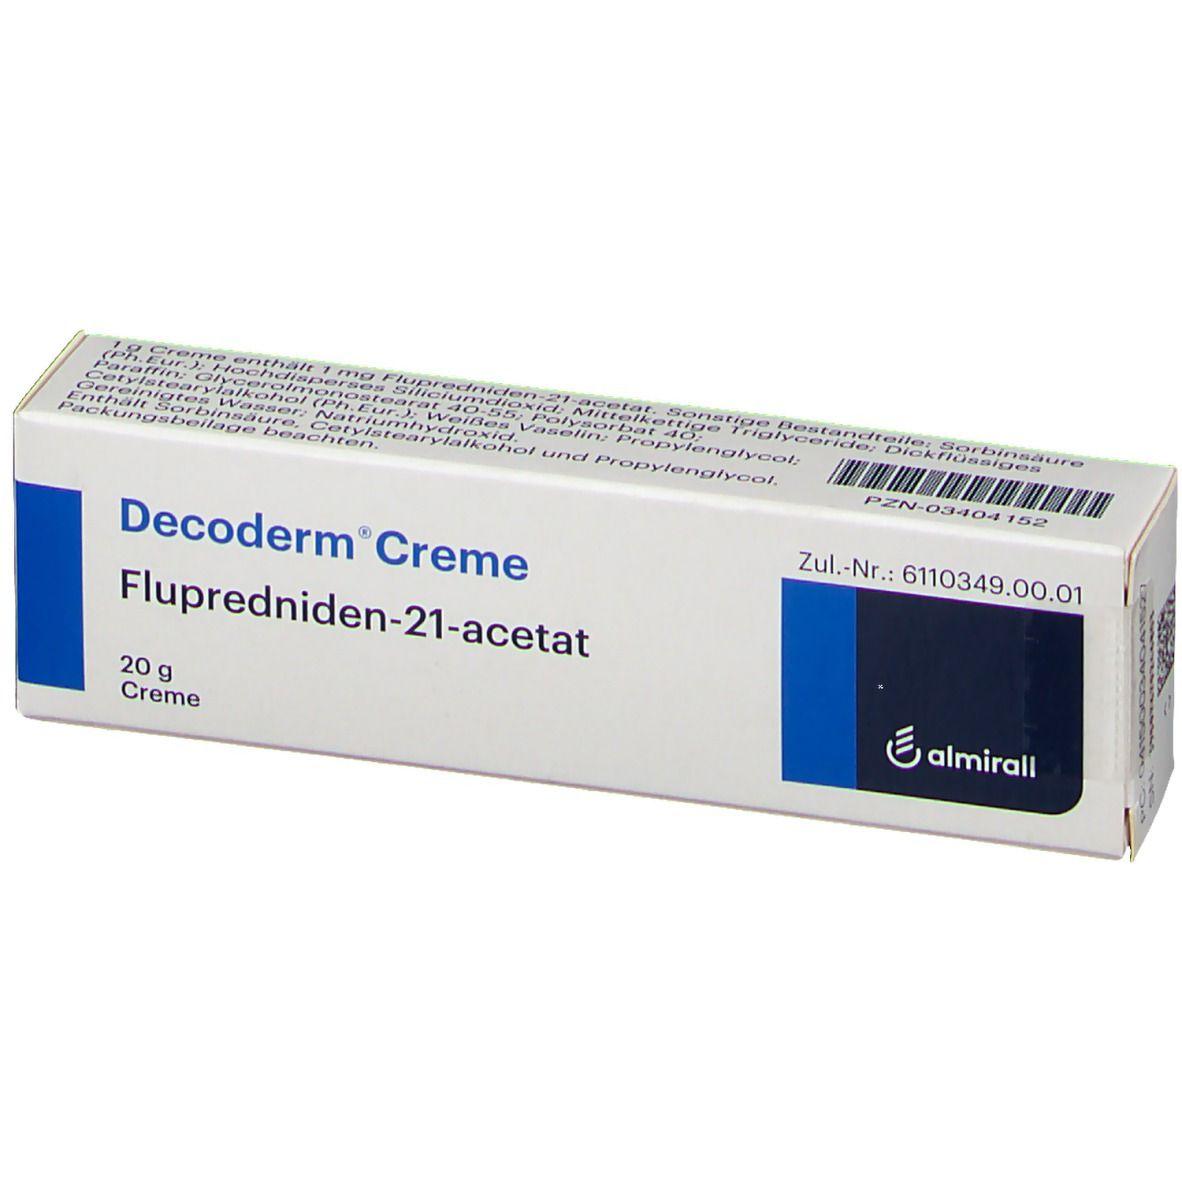 Decoderm® Creme 20 g - shop-apotheke.com